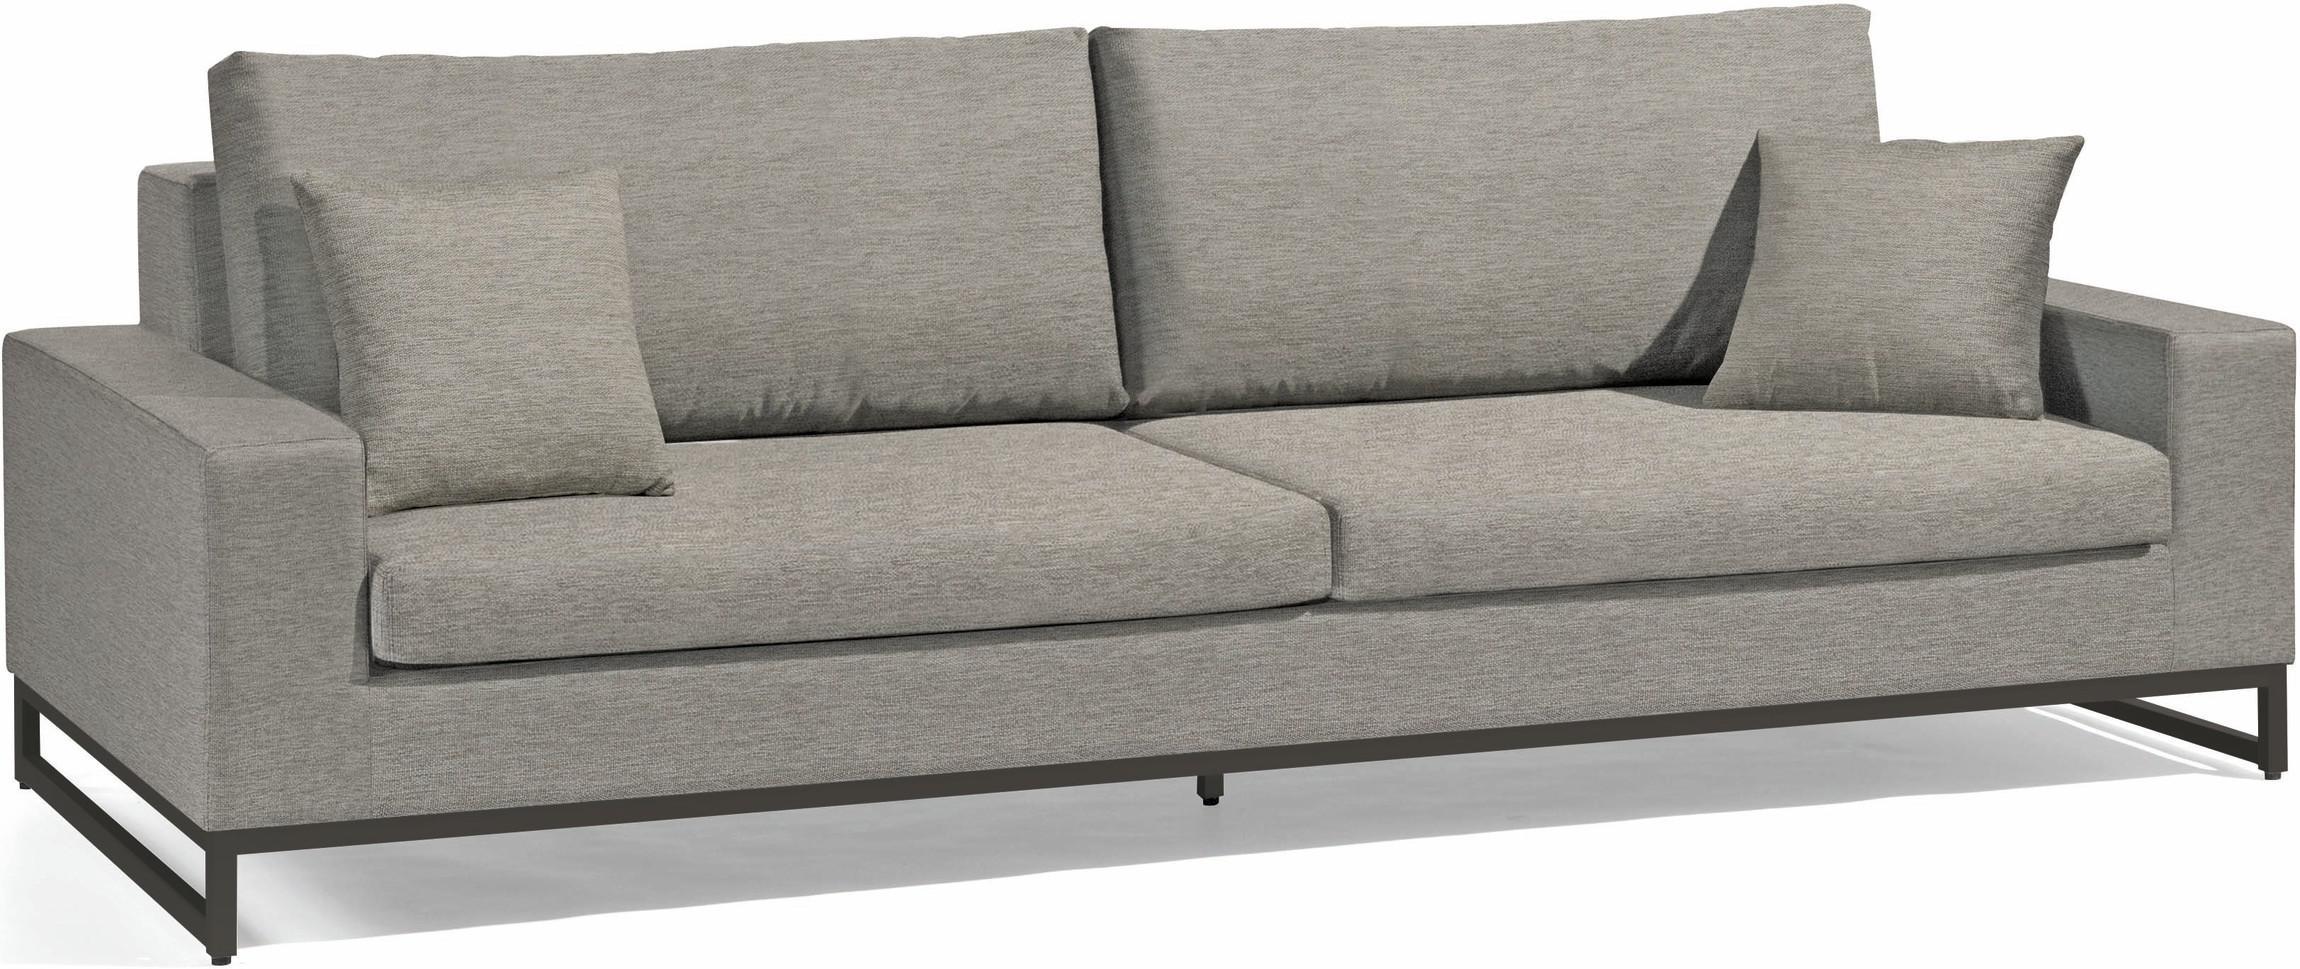 Zendo Sofa fixed - Lotus Sparrow 234